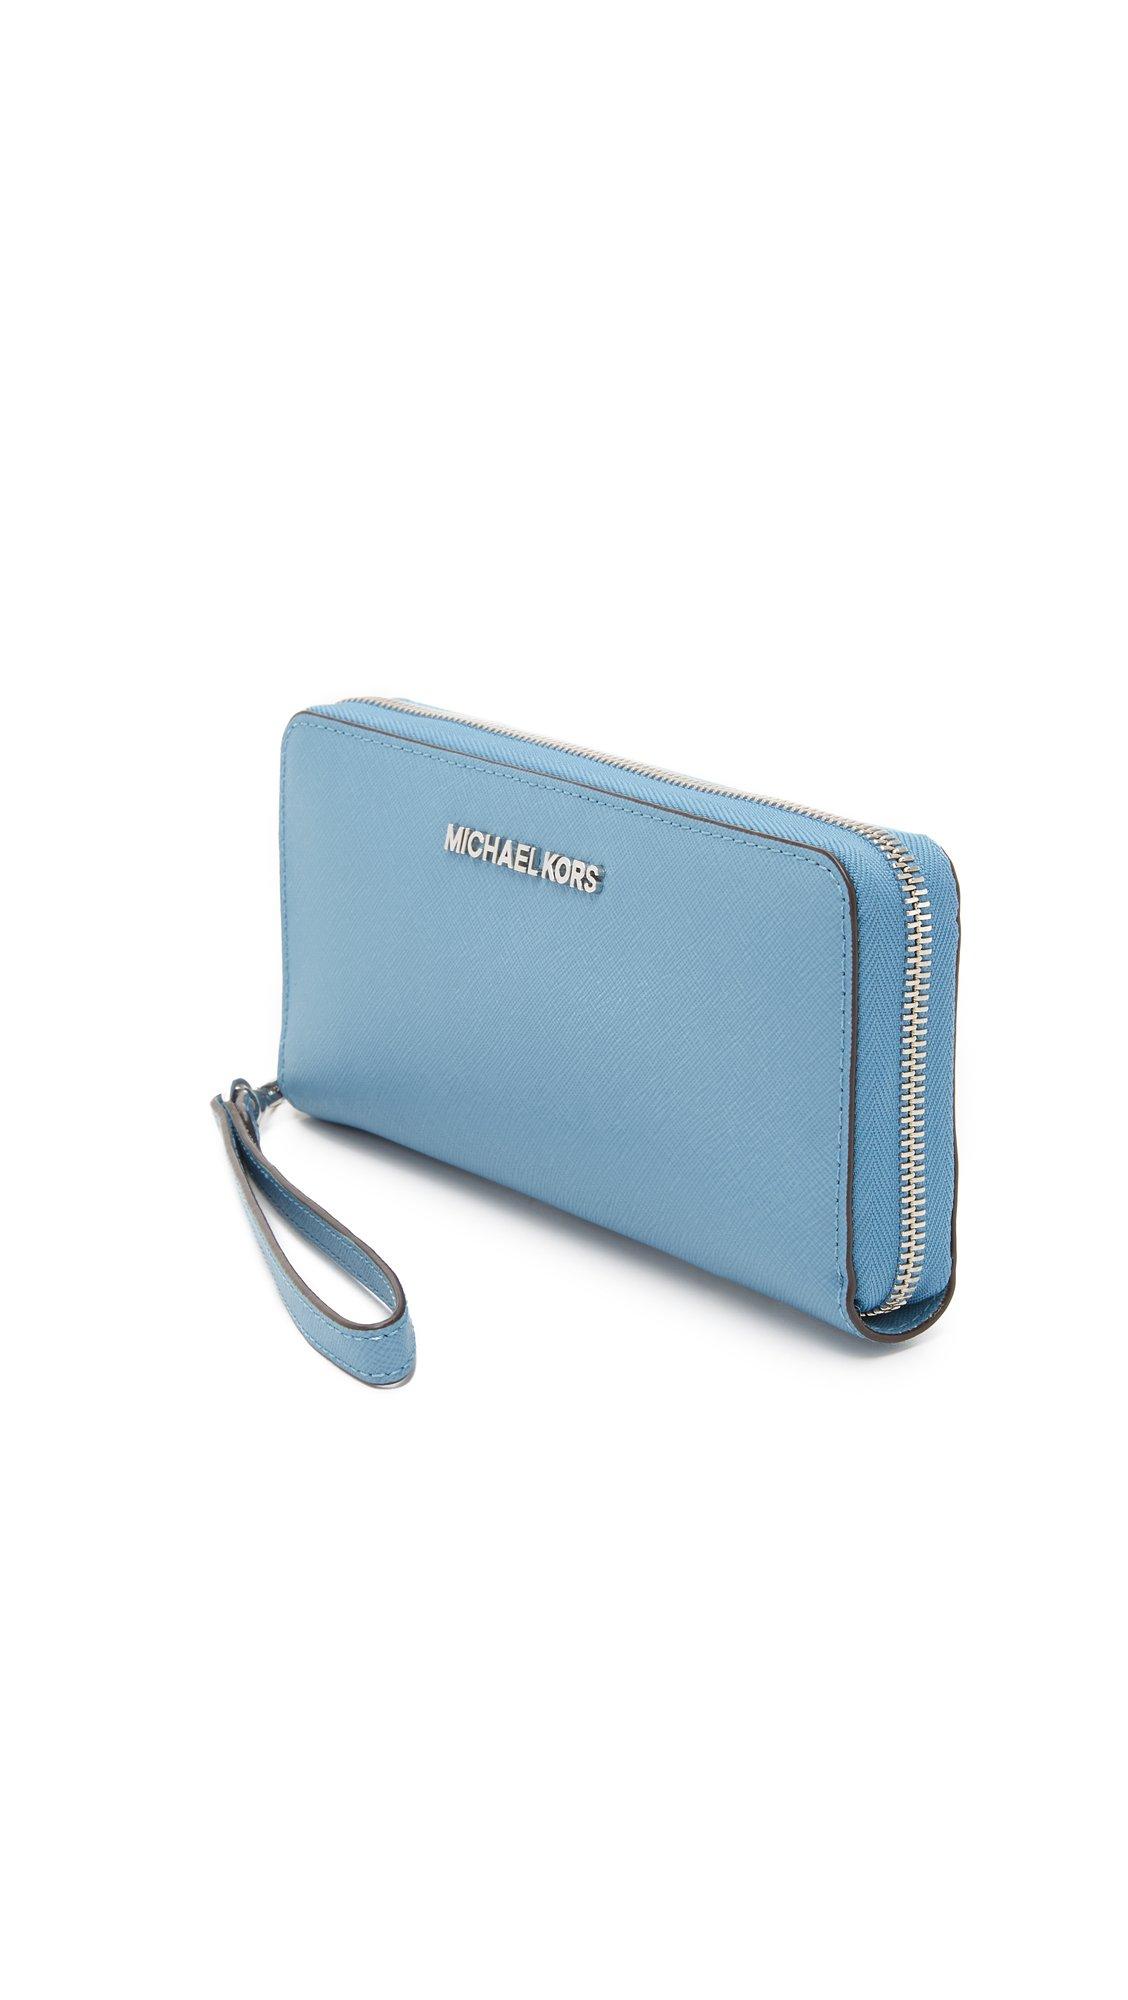 4315281afaab MICHAEL Michael Kors Jet Set Travel Continental Wallet in Blue - Lyst